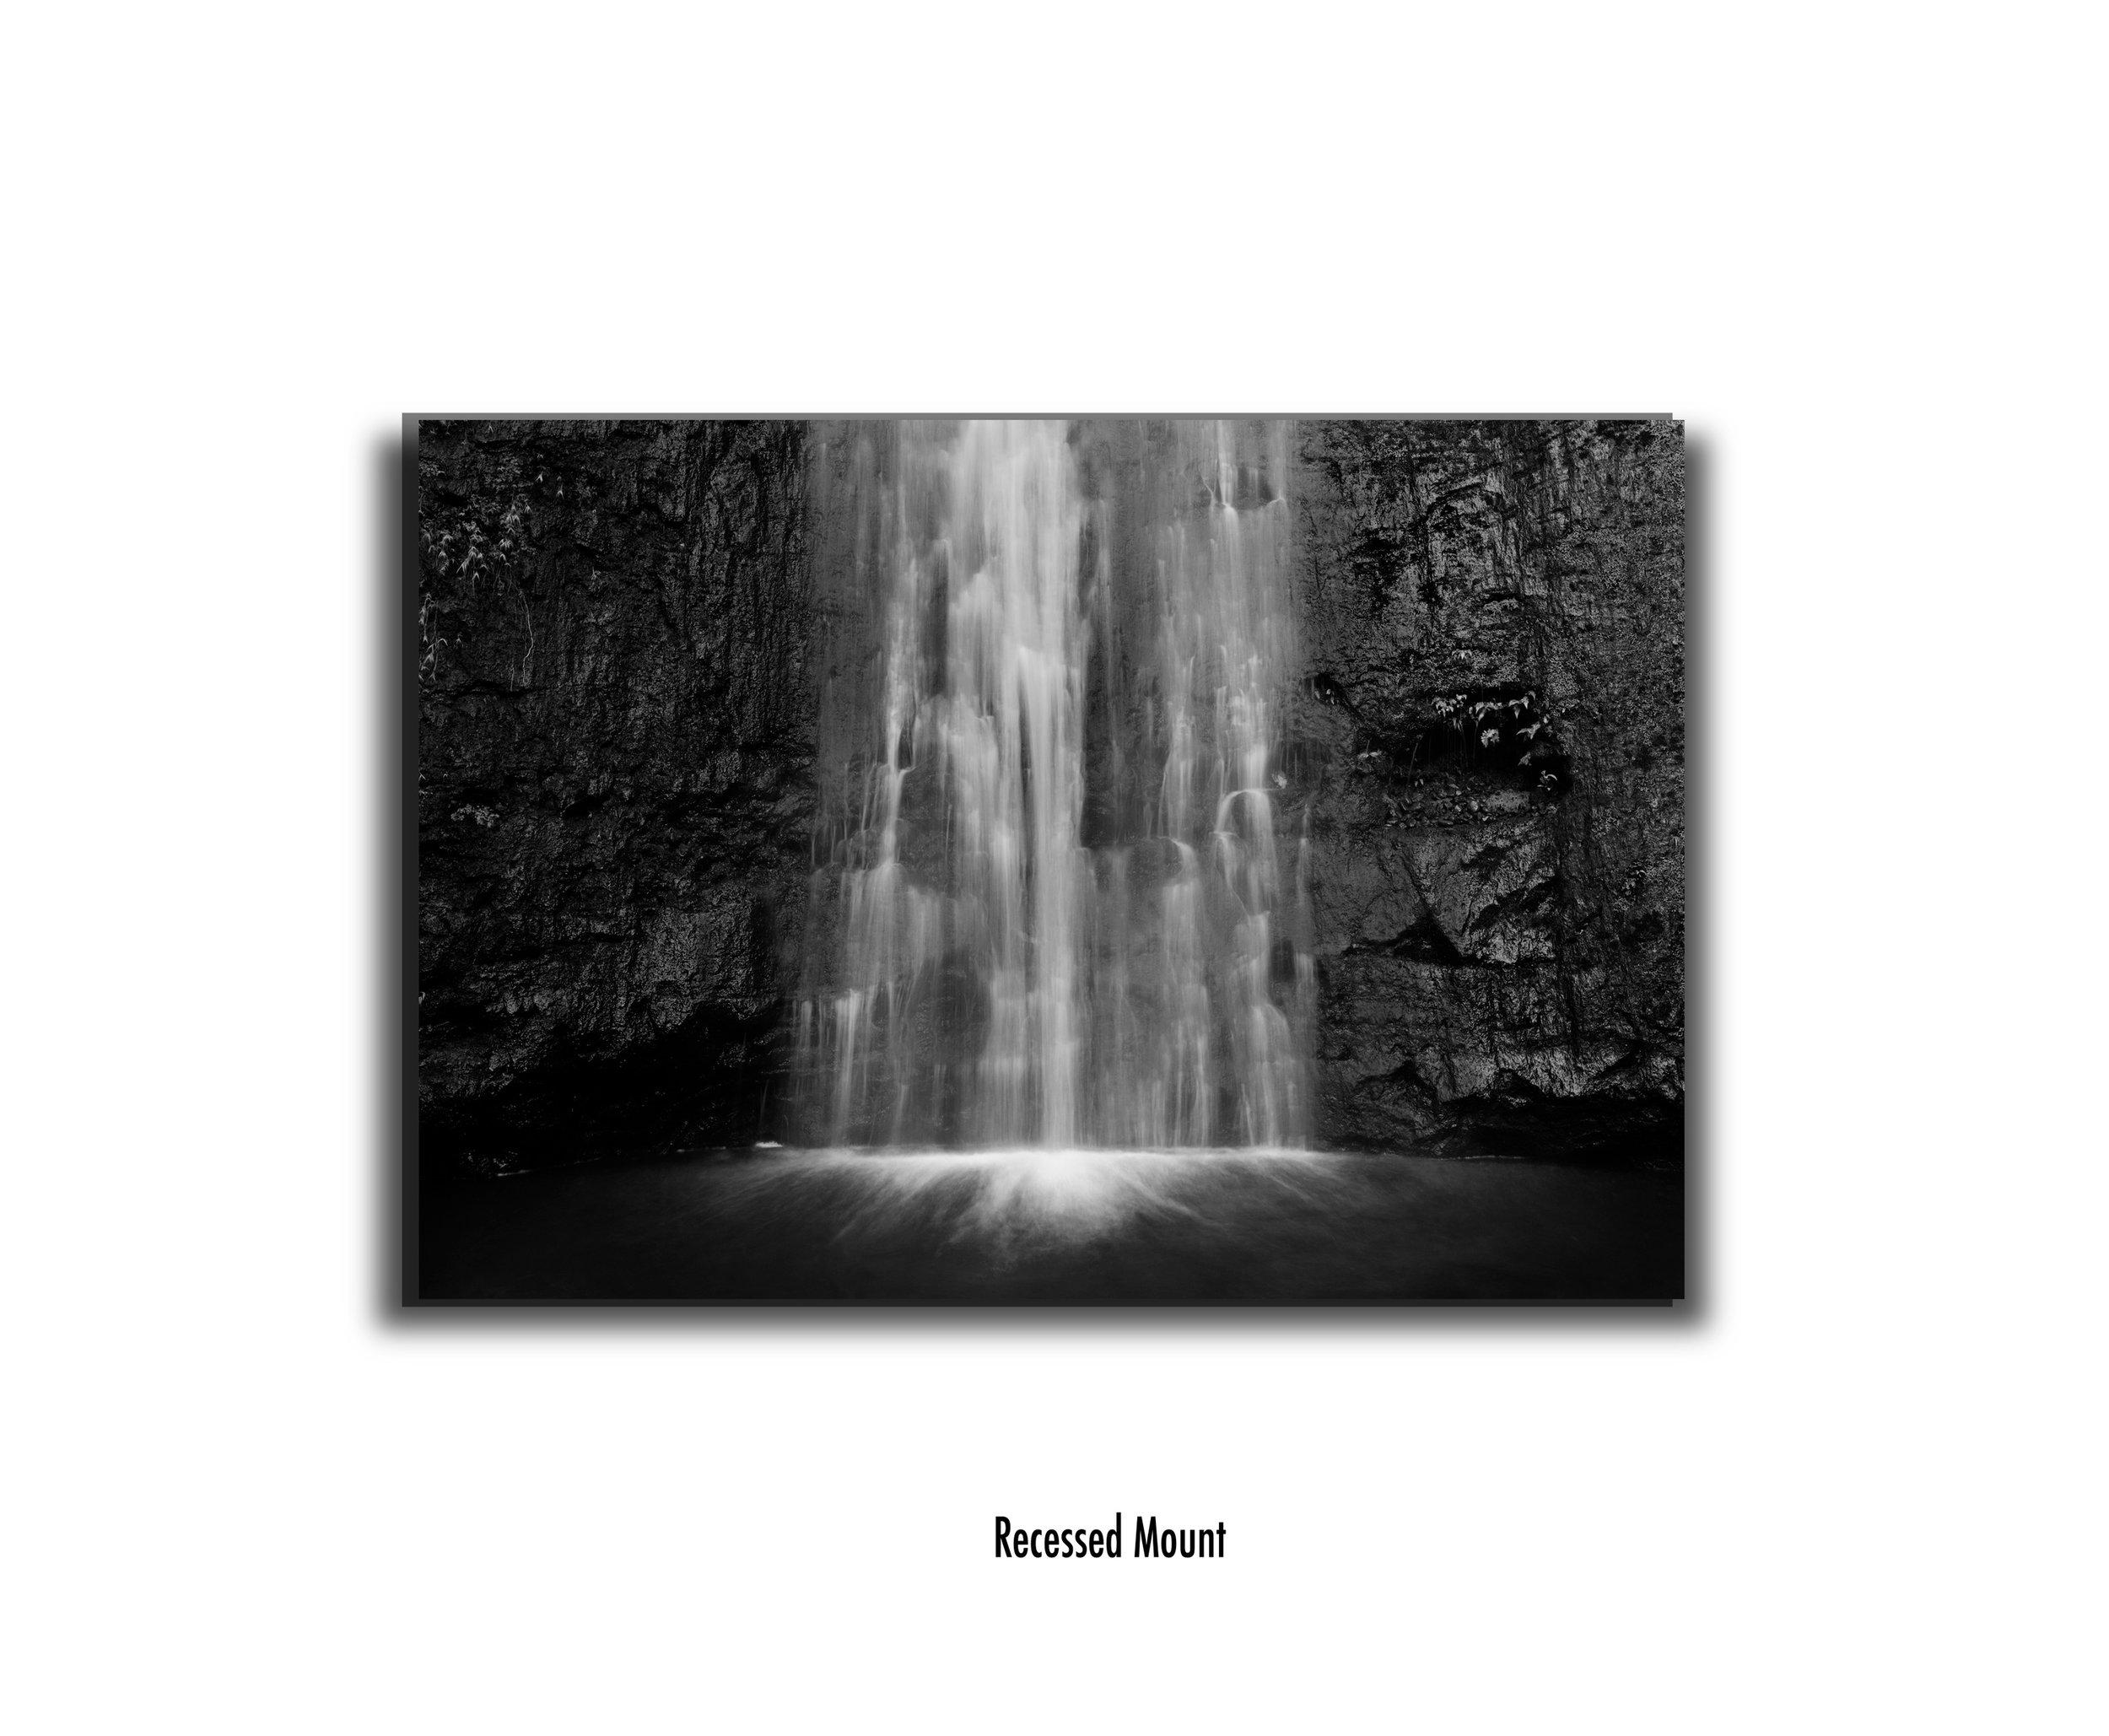 Manoa-Falls-recessed-mount.jpg